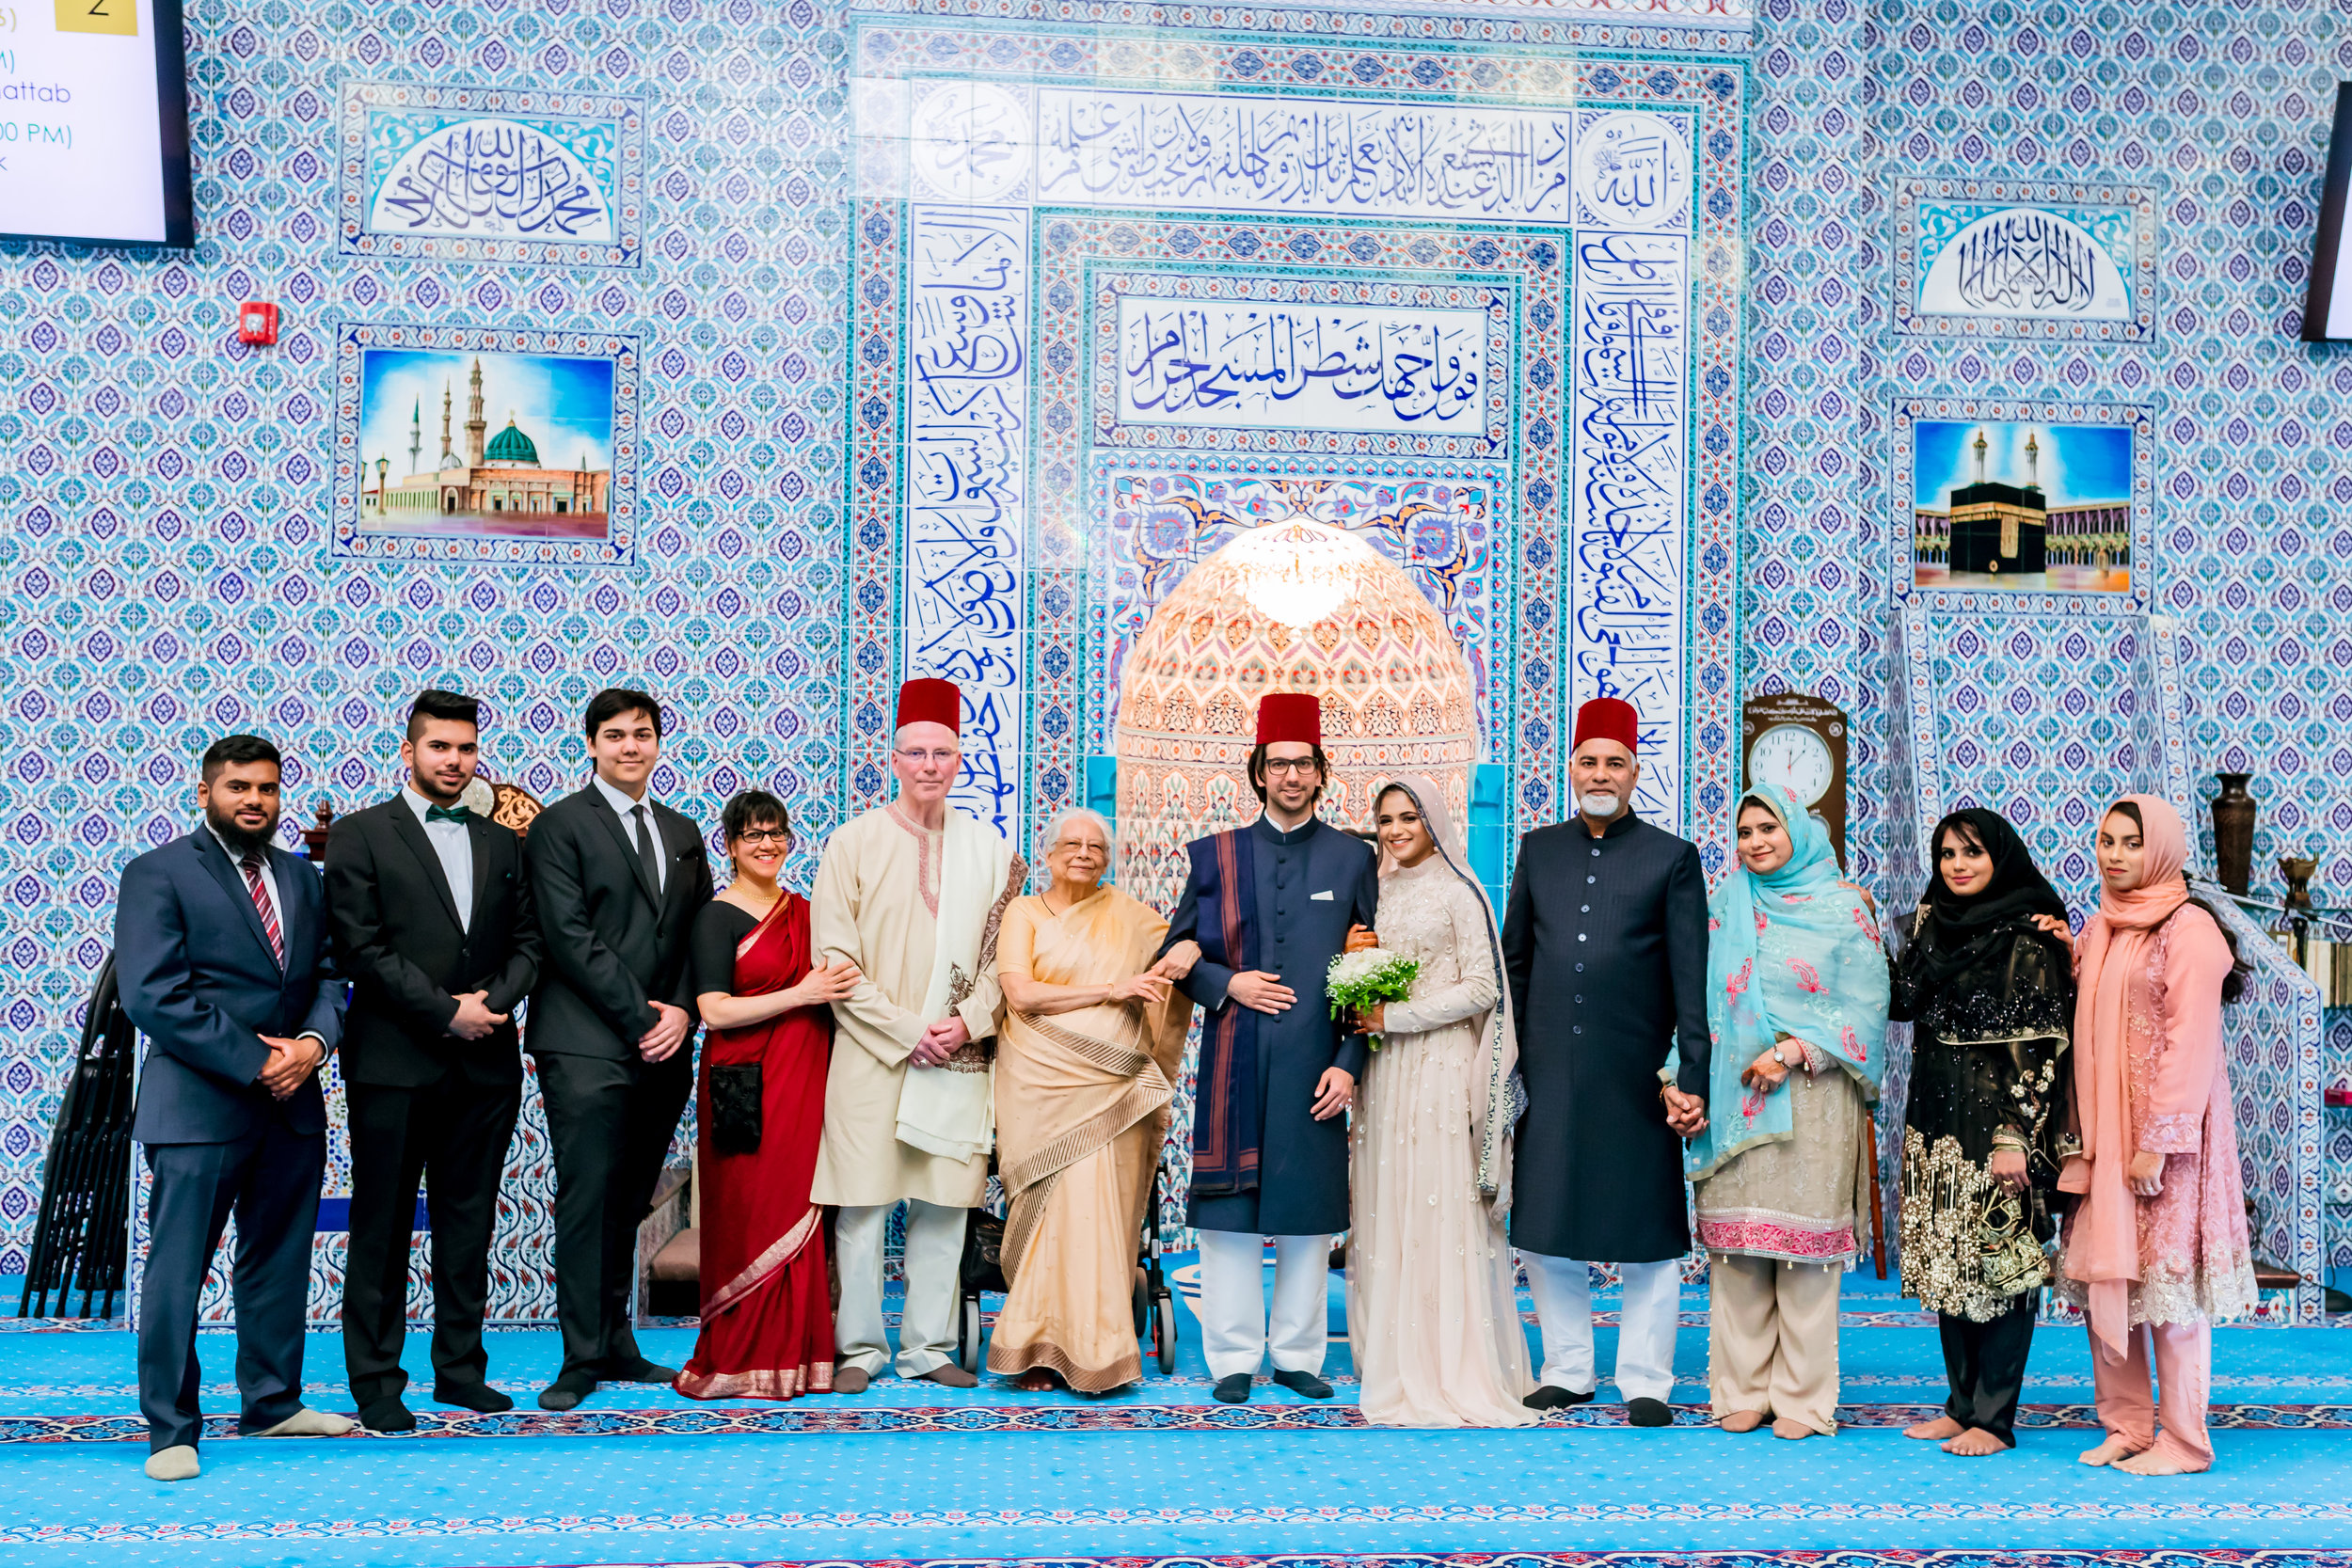 Karimah_Gheddai_Muslim_Sayeda_Khadija_Centre_Kariya_Park_GTA-Pakistani-Indian-Wedding-Engagement-Photographer-Photography_00025